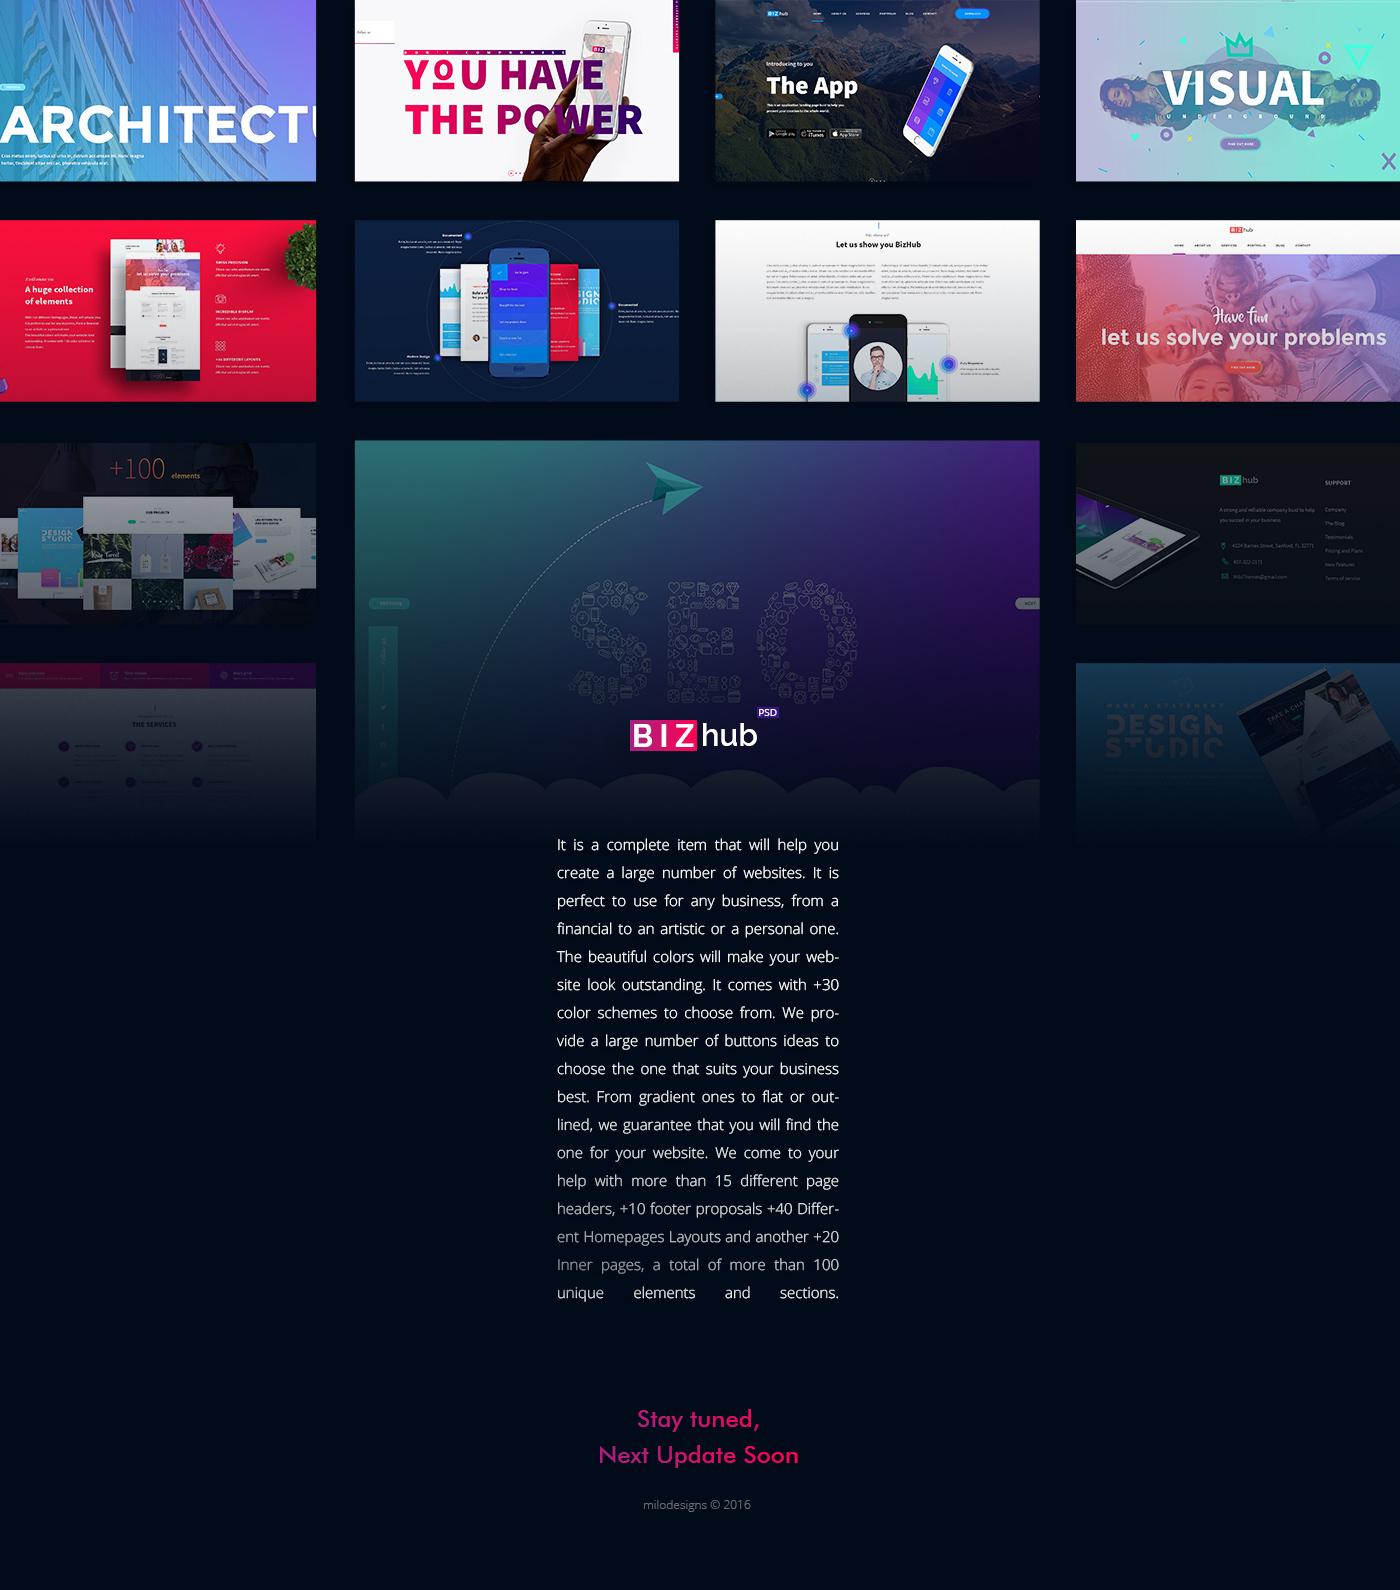 premium wordpress theme unique design Business Website minimal clean Blog psd download psd files template